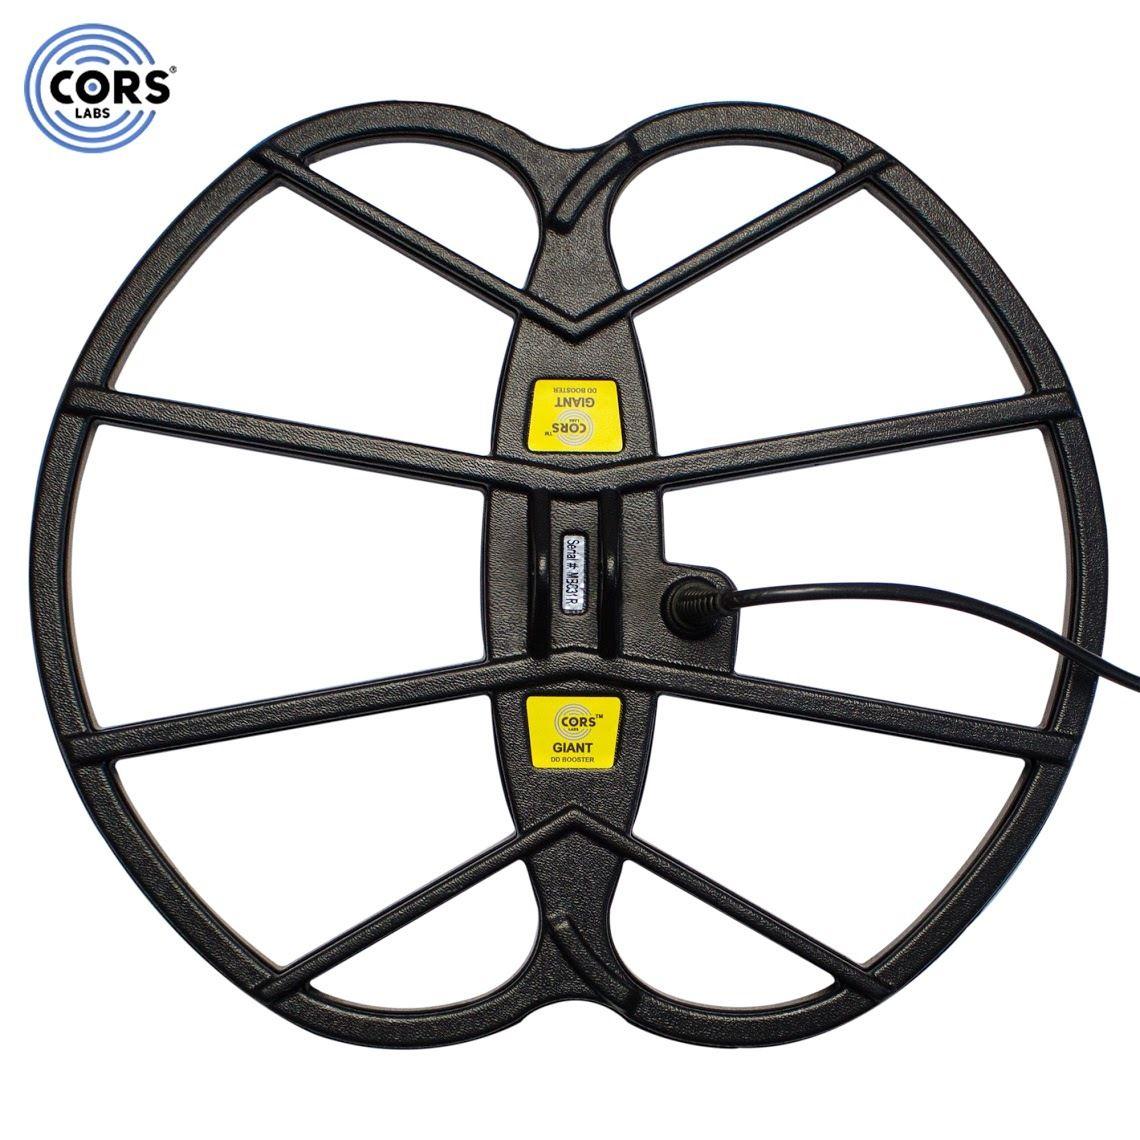 CORS Hochleistungsspule für Metalldetektor Garrett ACE 150/200i/250/300i/350/EuroAce/400i